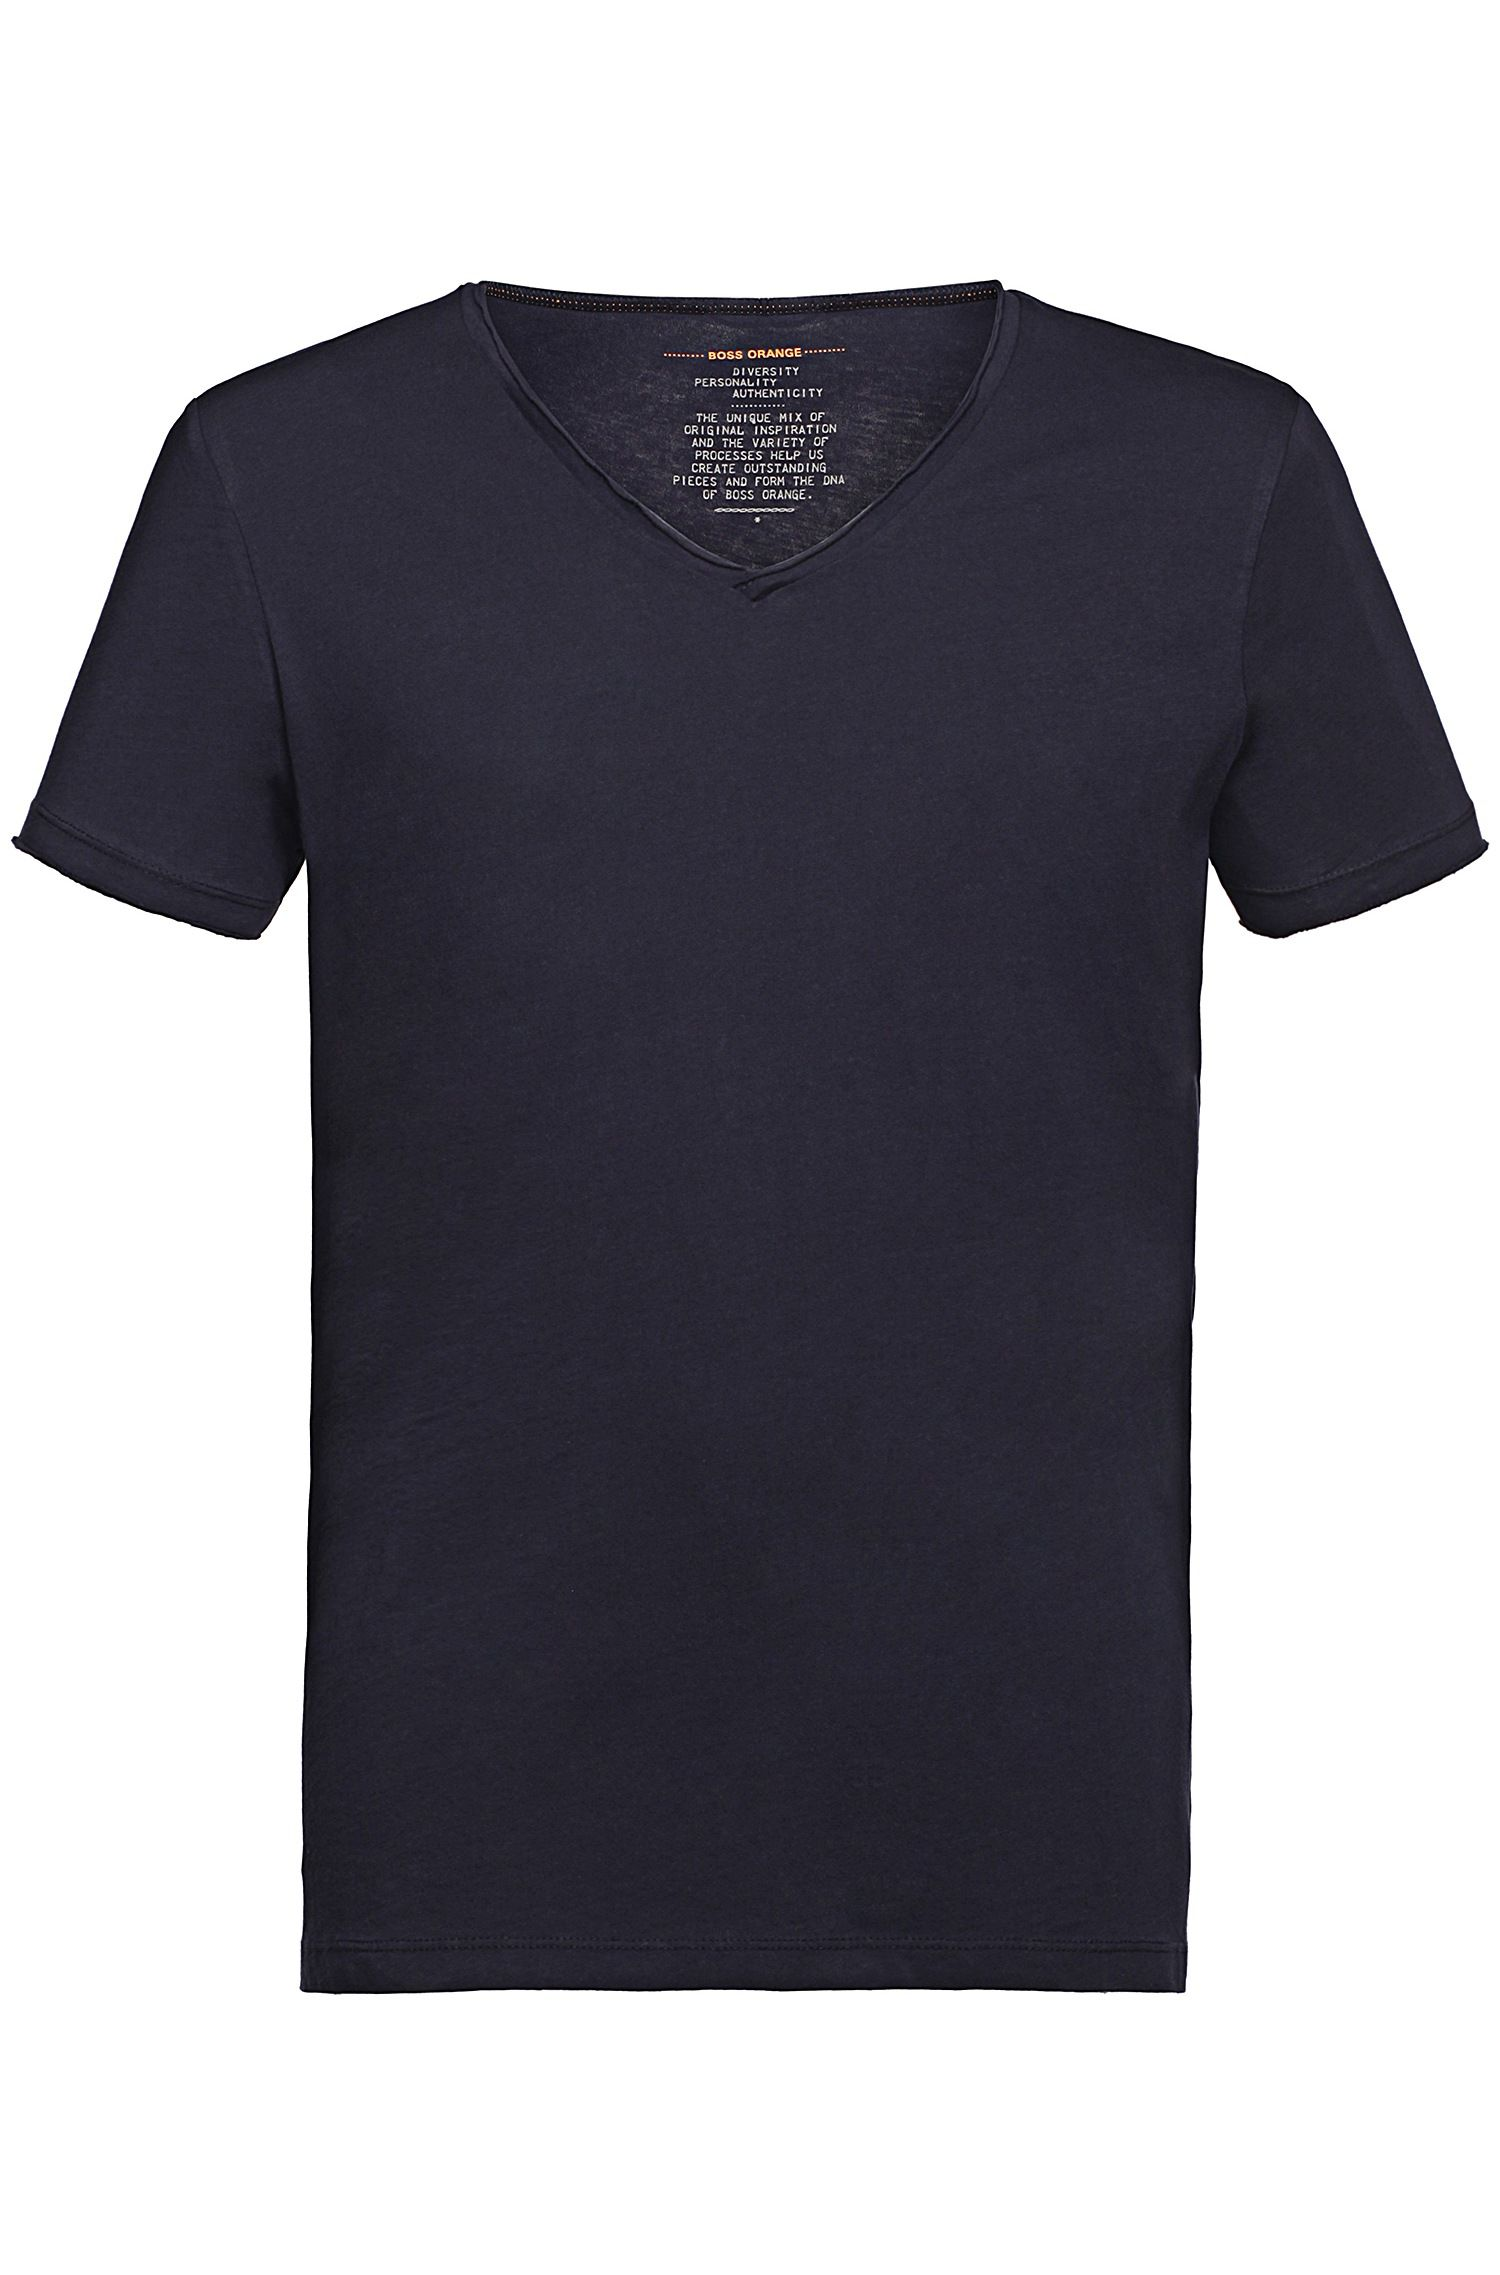 T-shirt Regular Fit, avec colV à bord franc